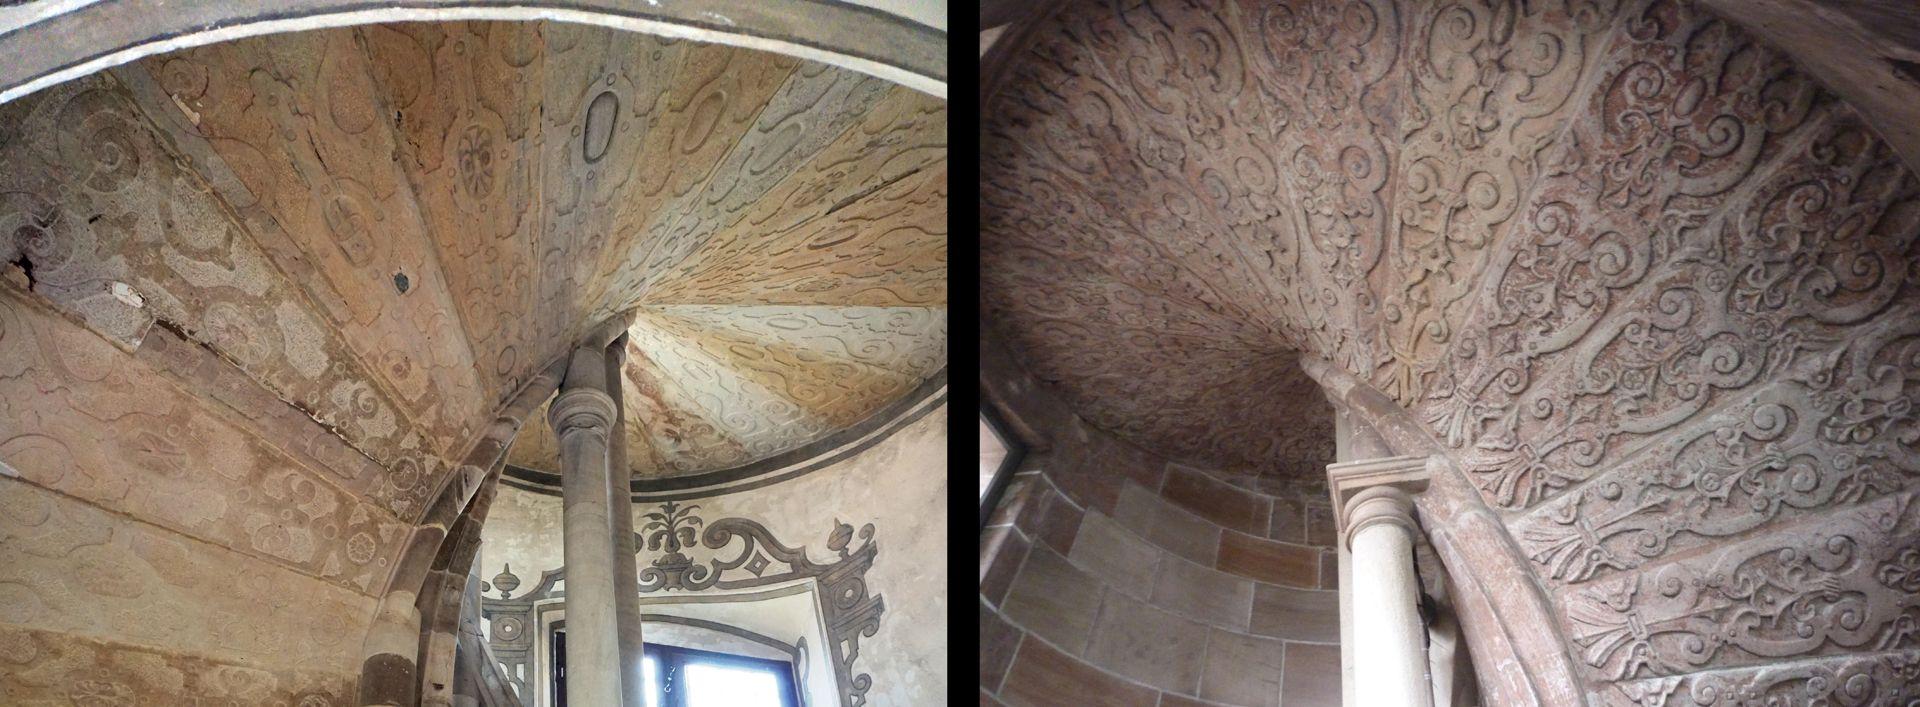 Treppentyp / Pellerhaus links Straßburg, rechts Nürnberg: Details